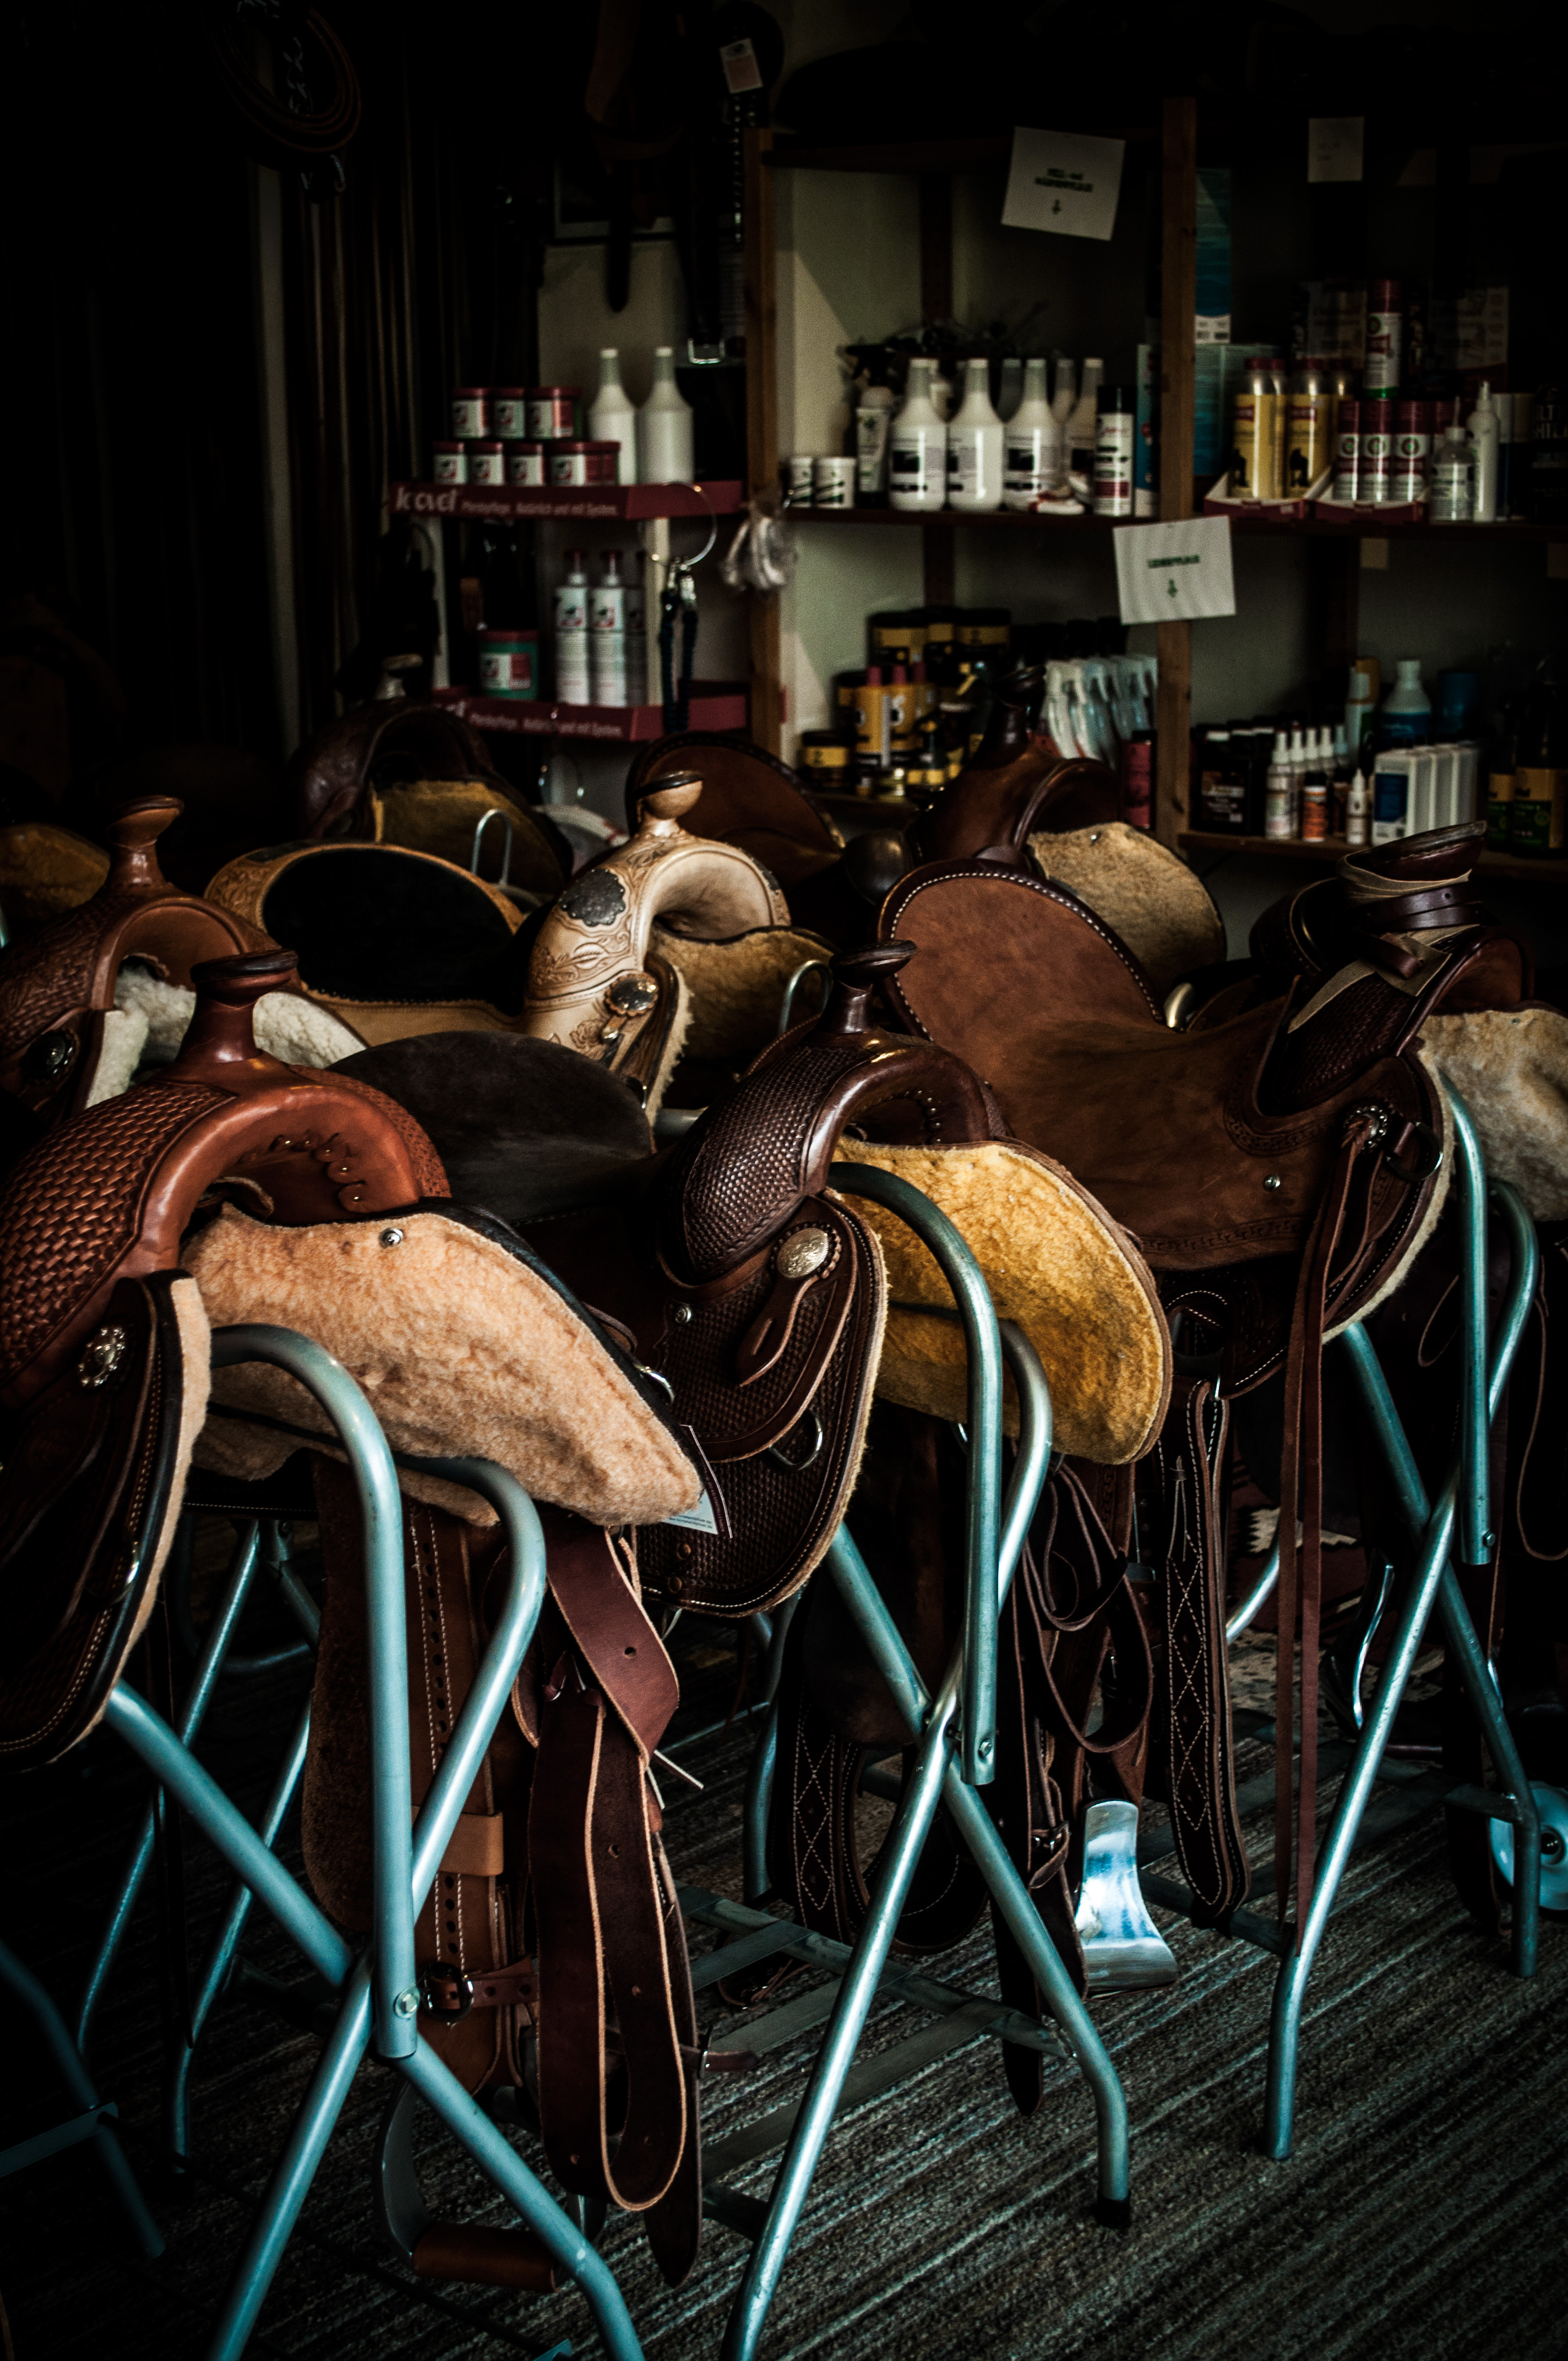 5606b42a8dfd79 Olaf Grauwinkel - Horse and Silver - Handschuhe